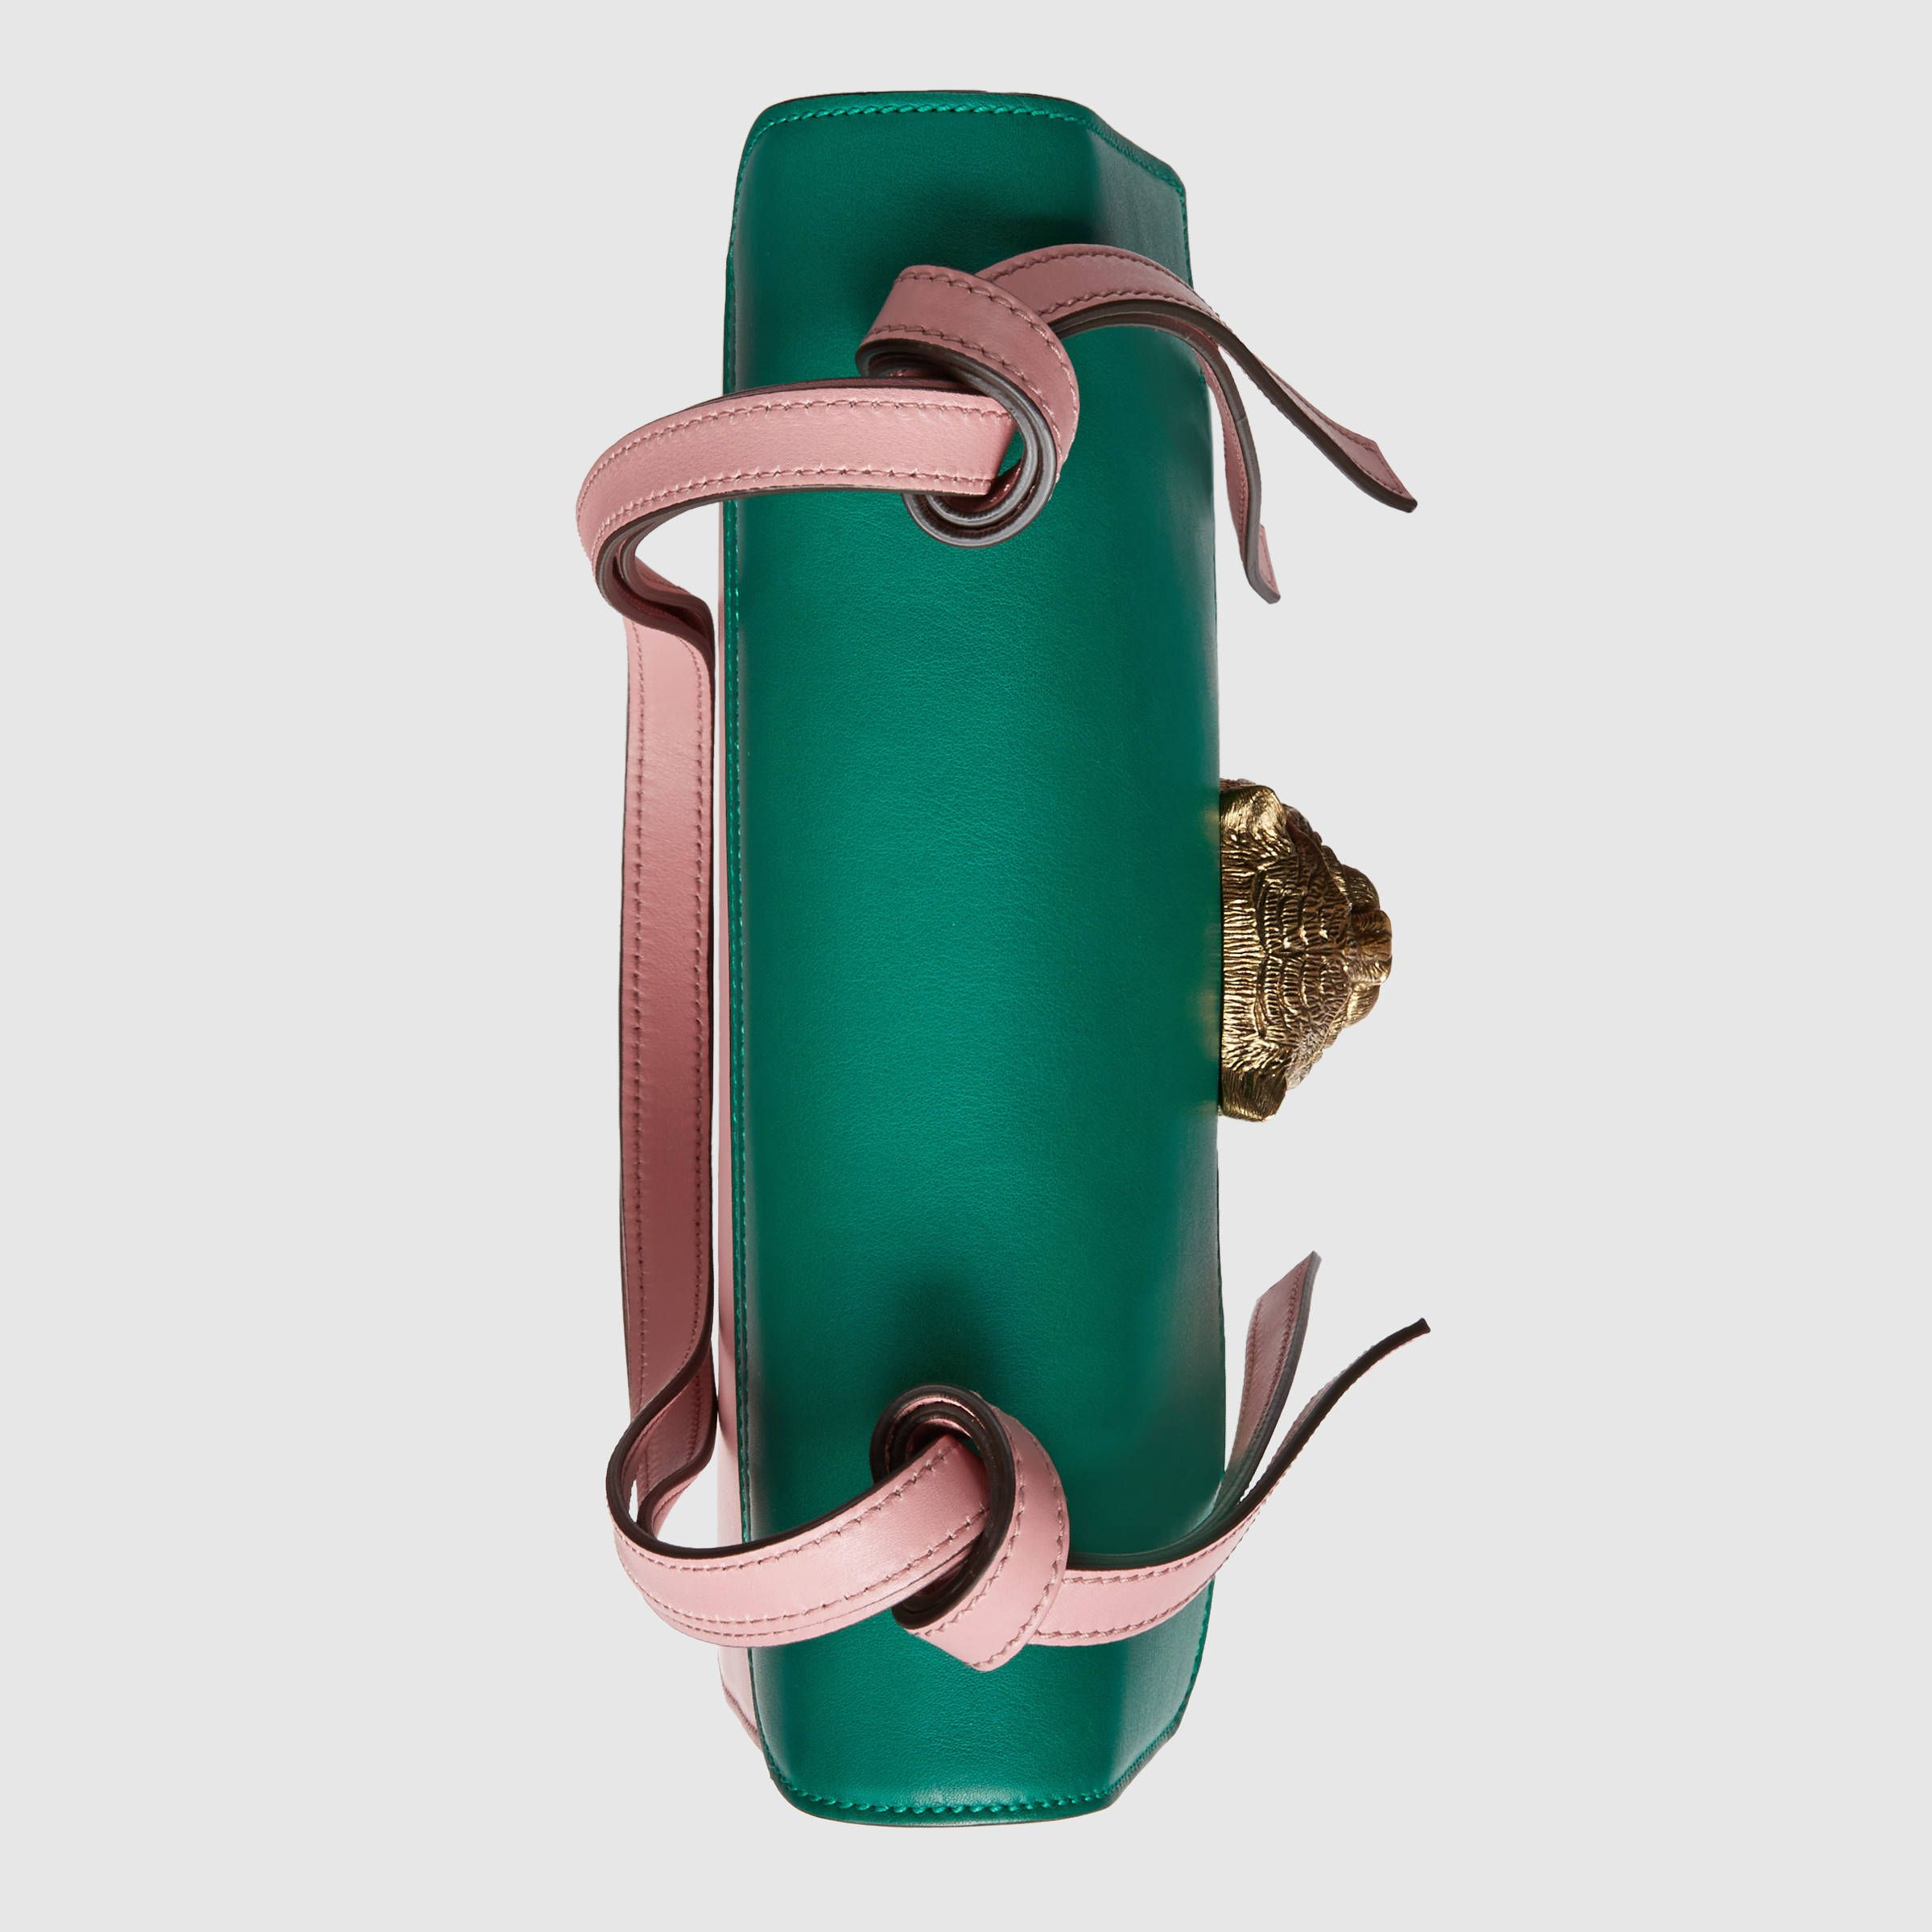 Gucci Animalier Shoulder Bag에 대한 이미지 검색결과